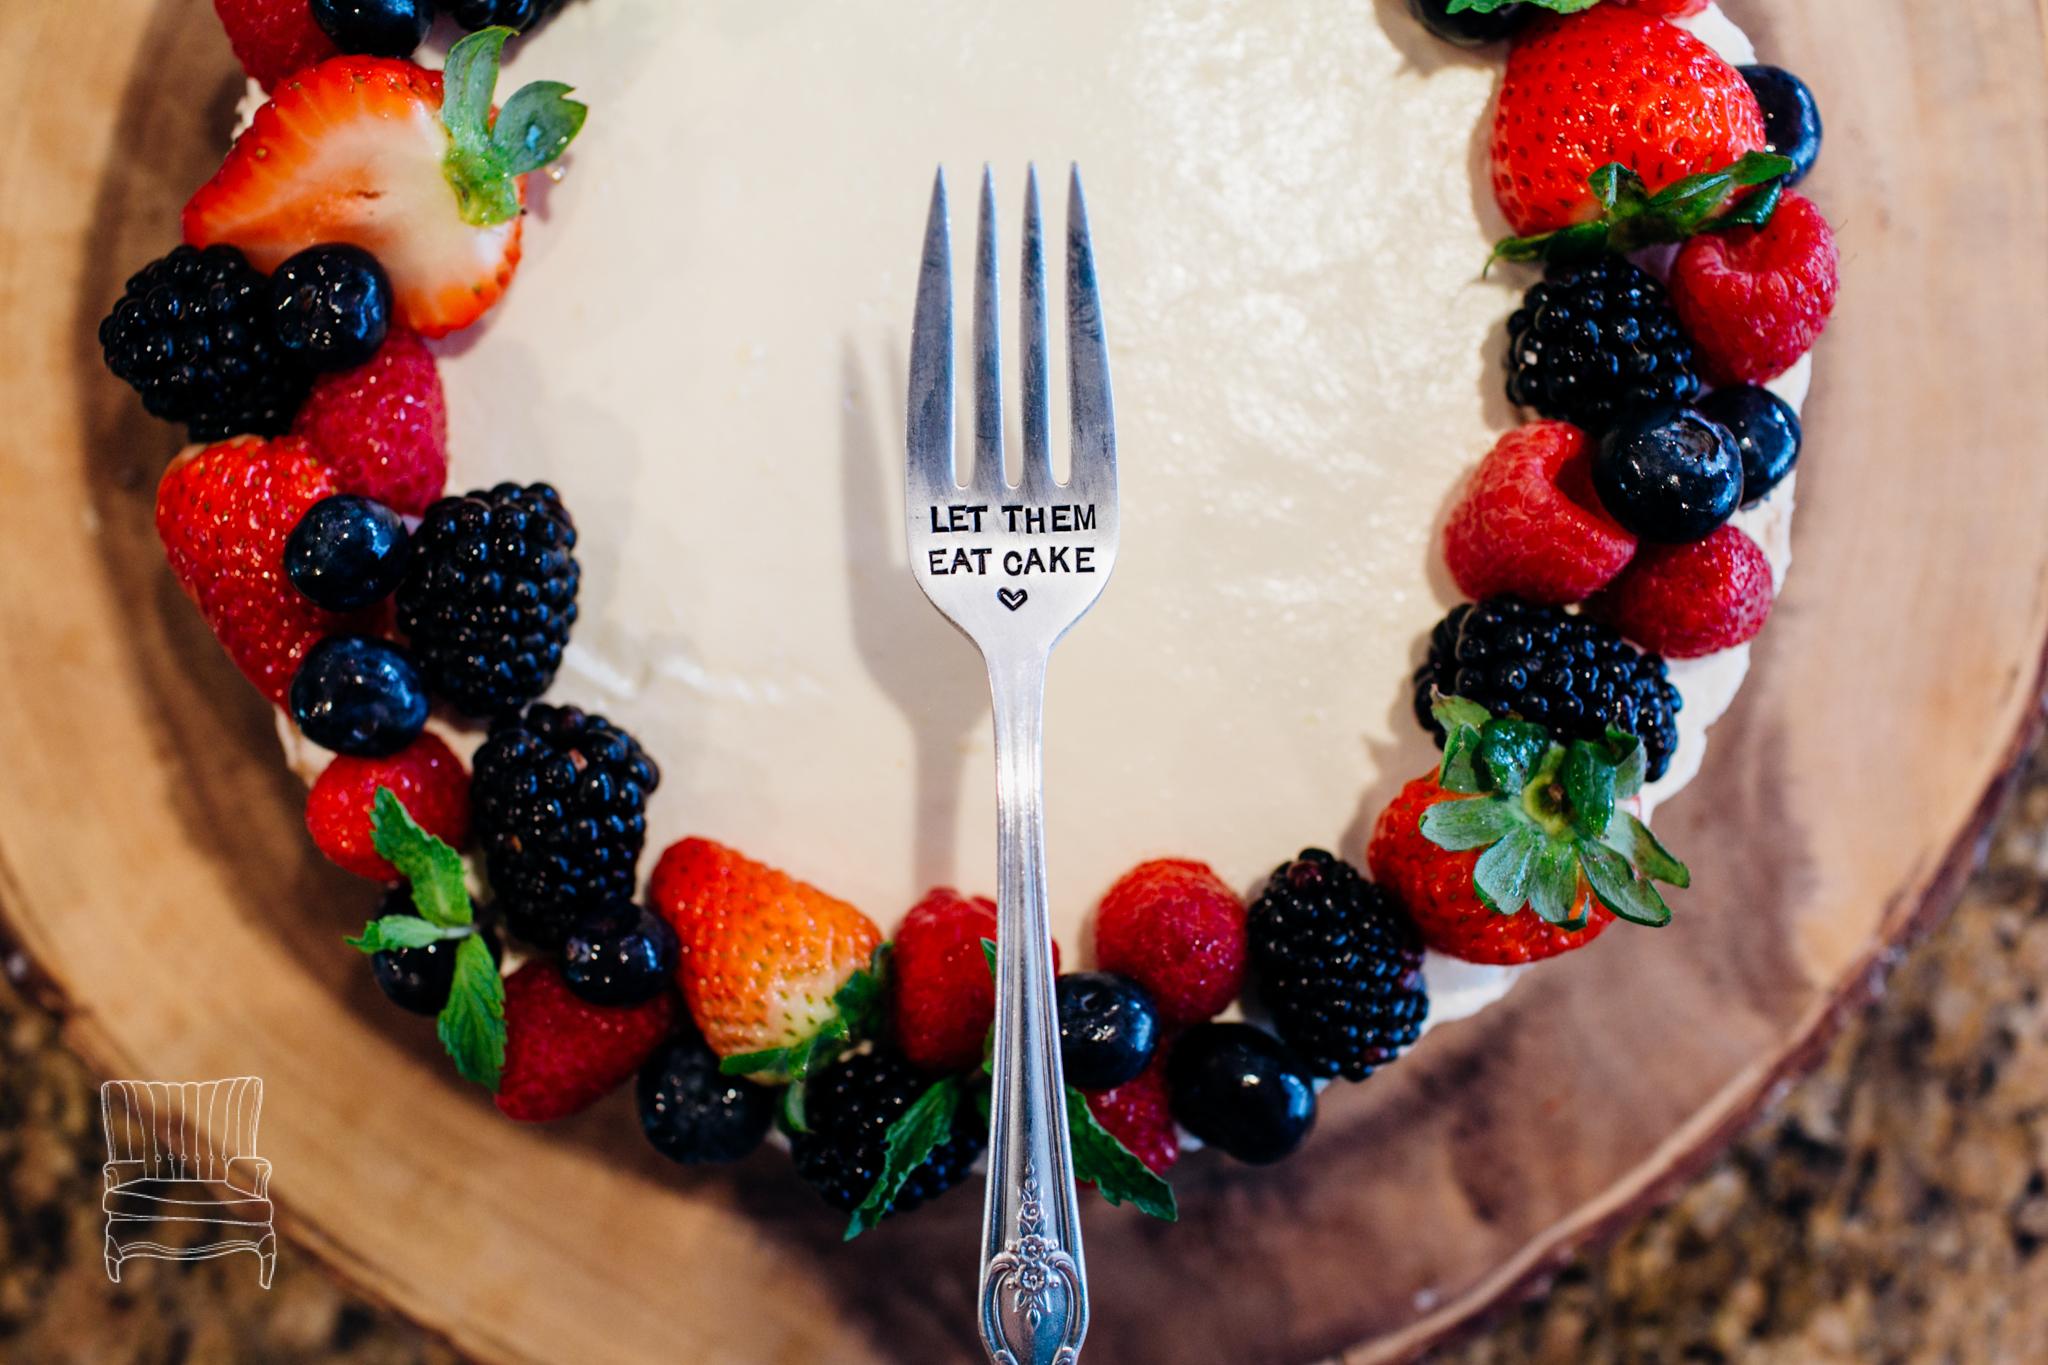 bellingham-food-marketing-photography-photo-1.jpg